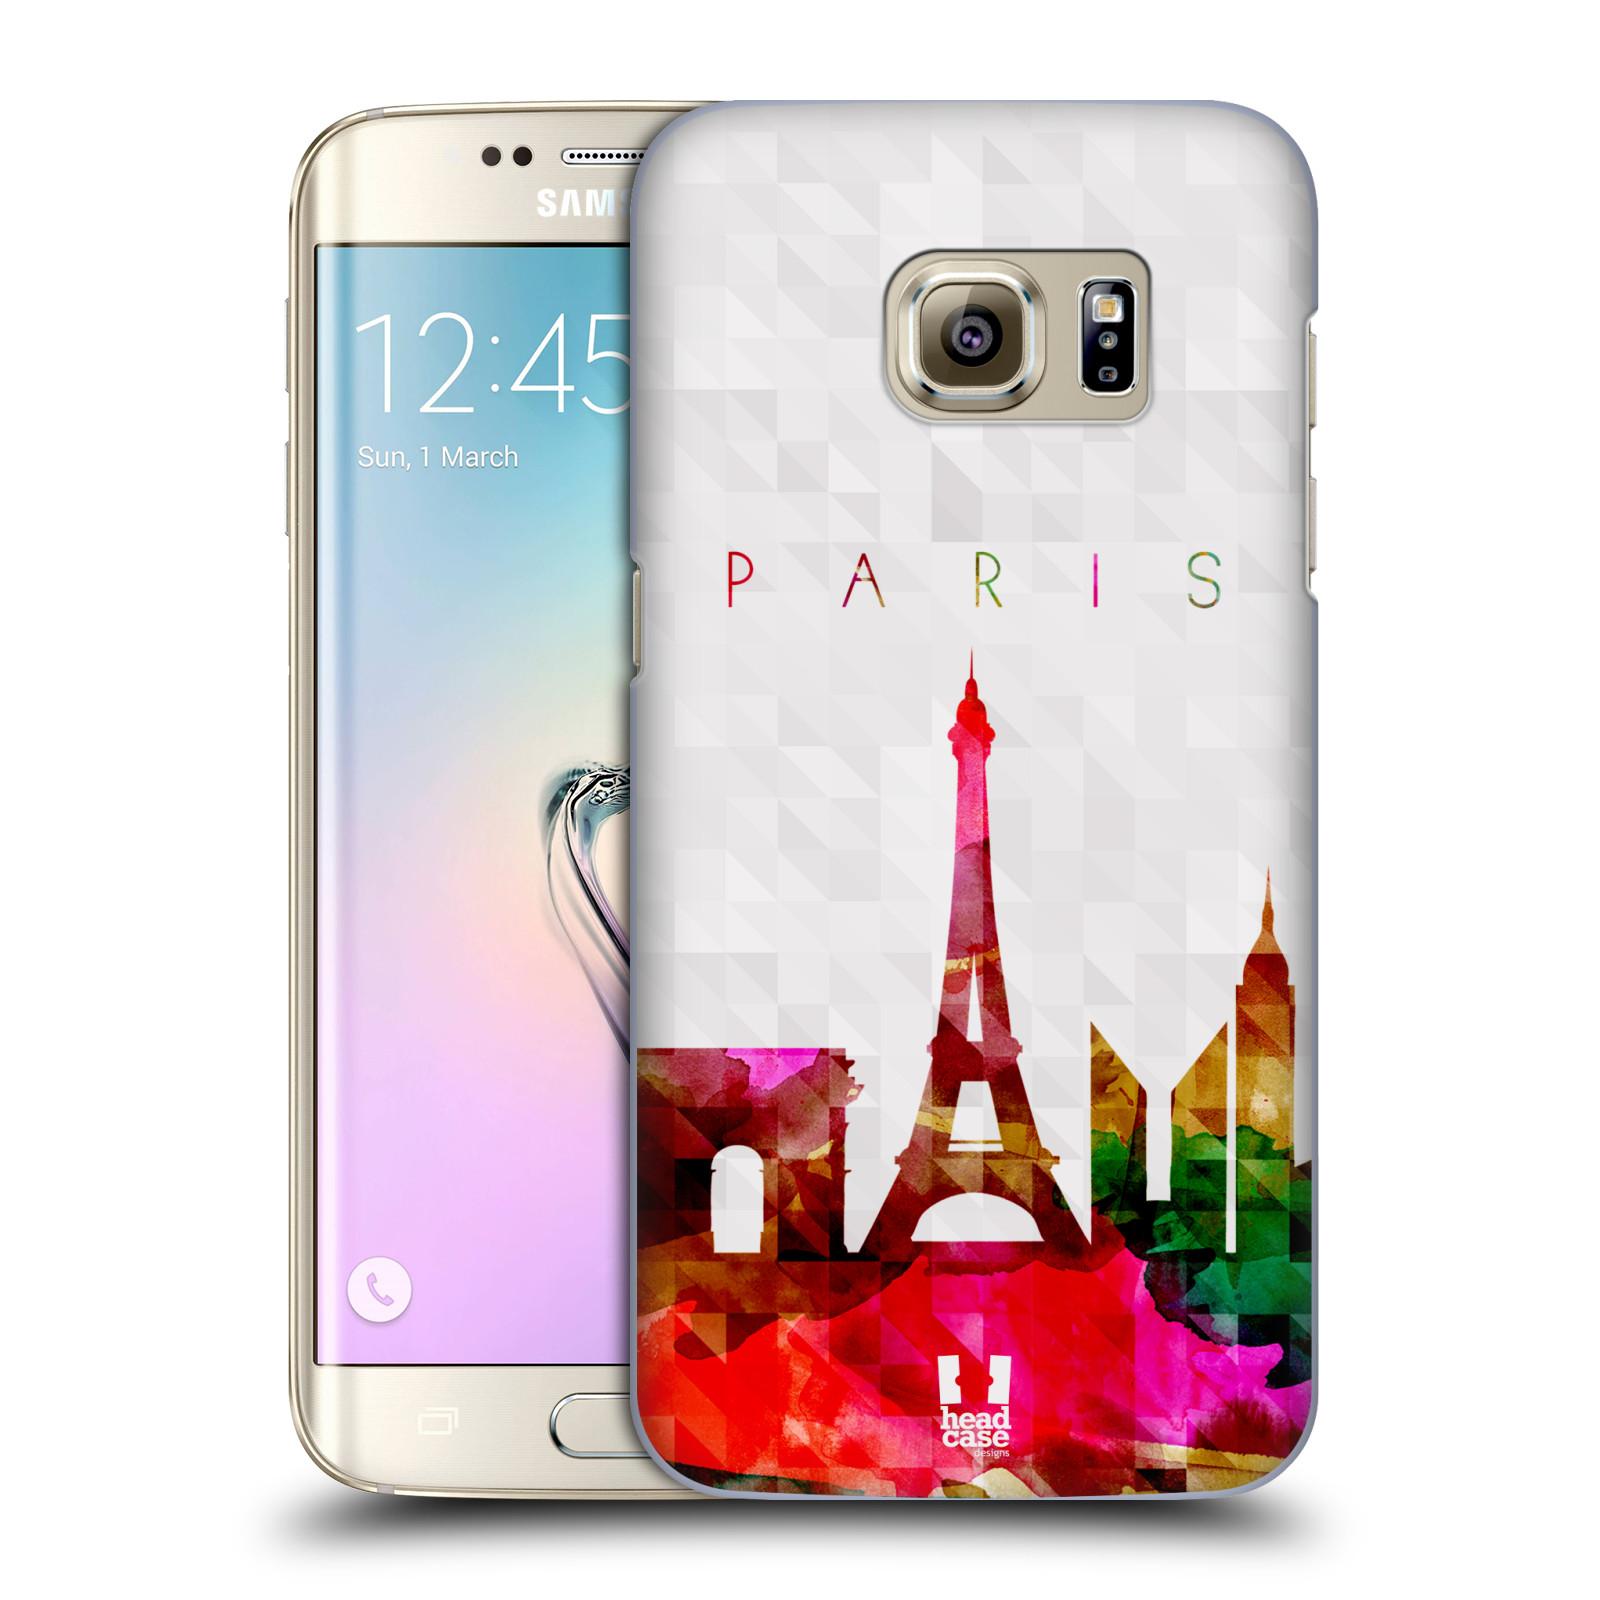 HEAD CASE plastový obal na mobil SAMSUNG GALAXY S7 EDGE vzor Vodní barva  města silueta PAŘÍŽ FRANICE EIFFELOVA VĚŽ 9ea9234f8f3